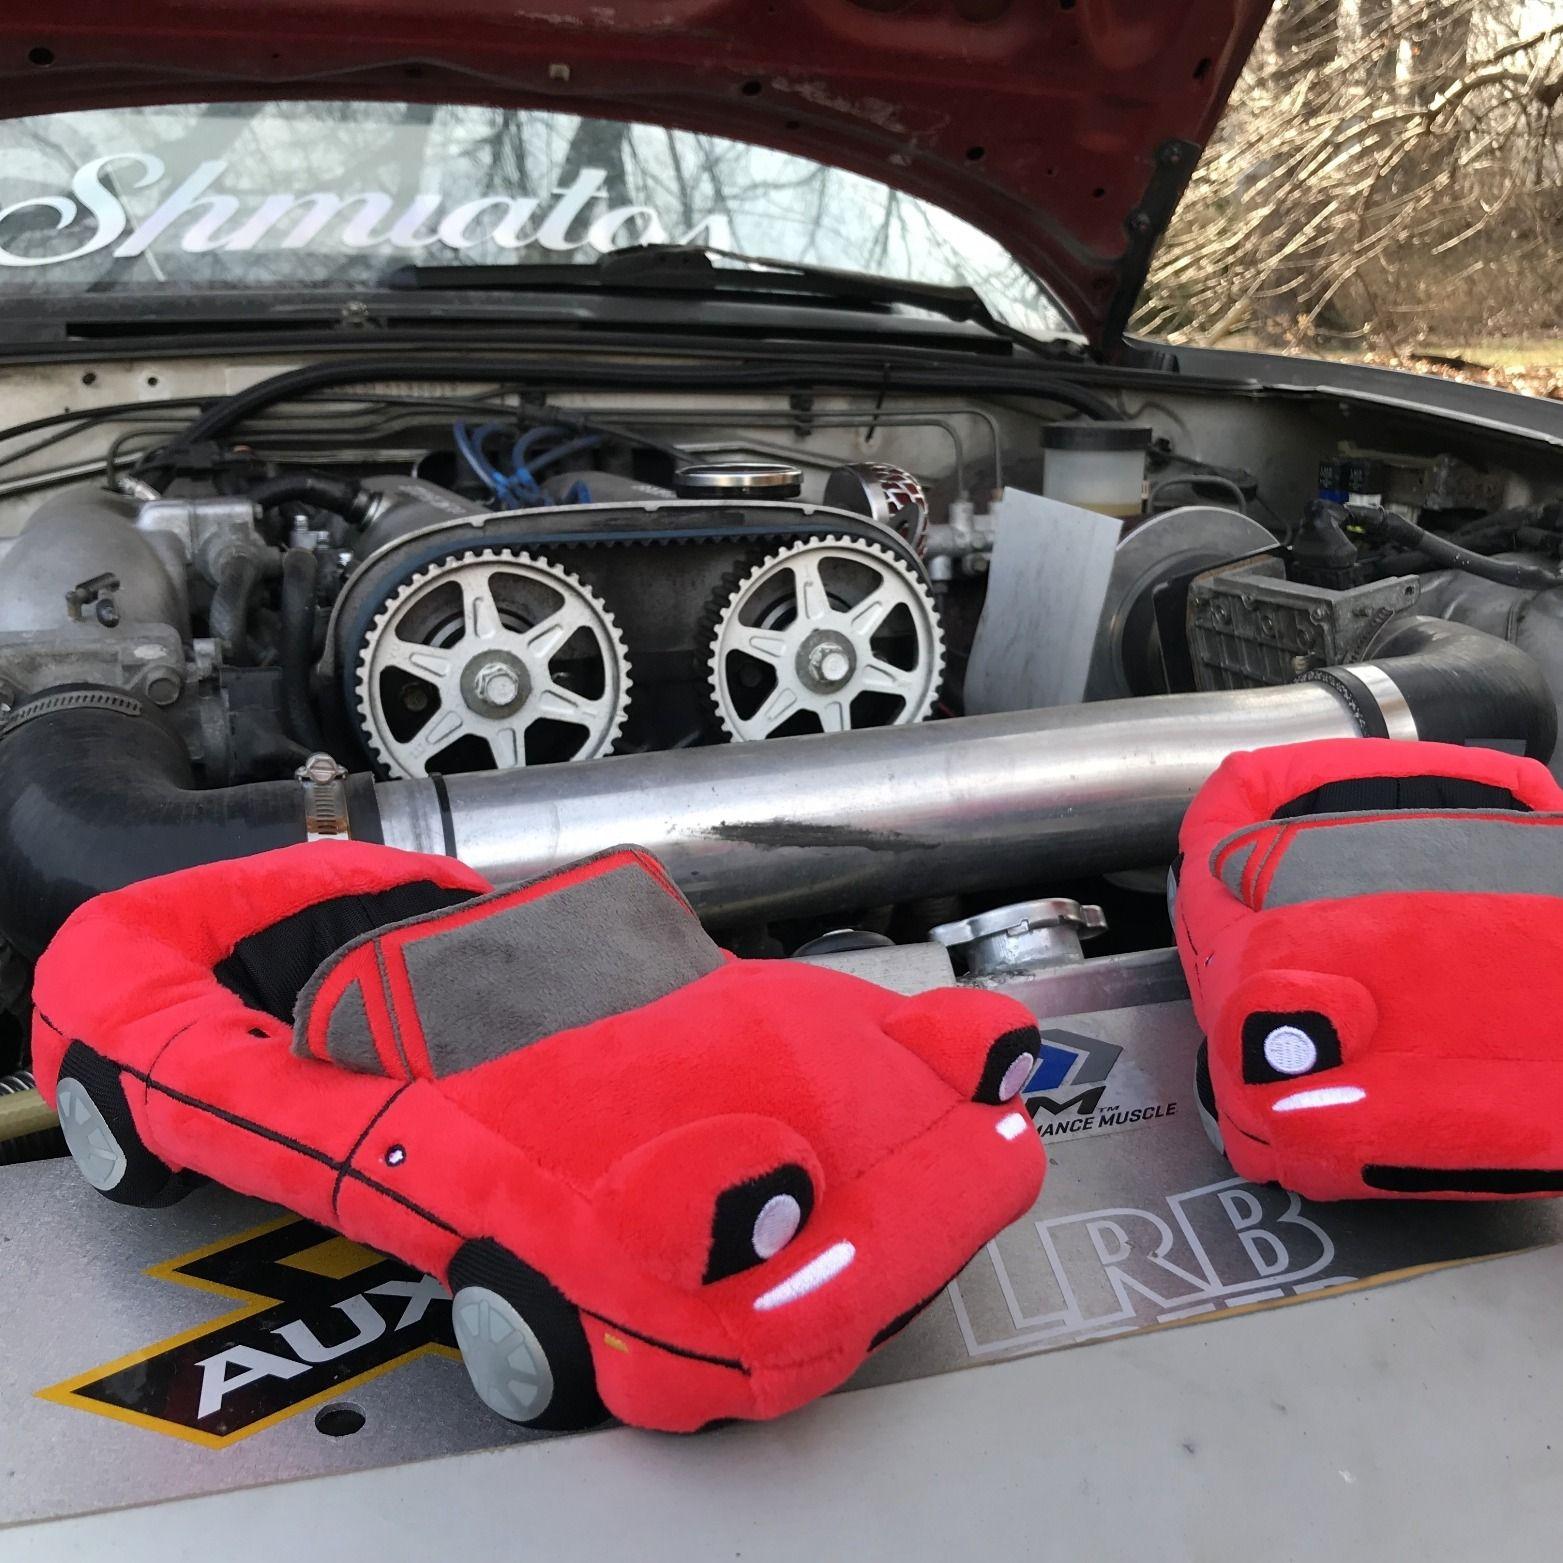 Buy Red Miata Plush Car Online